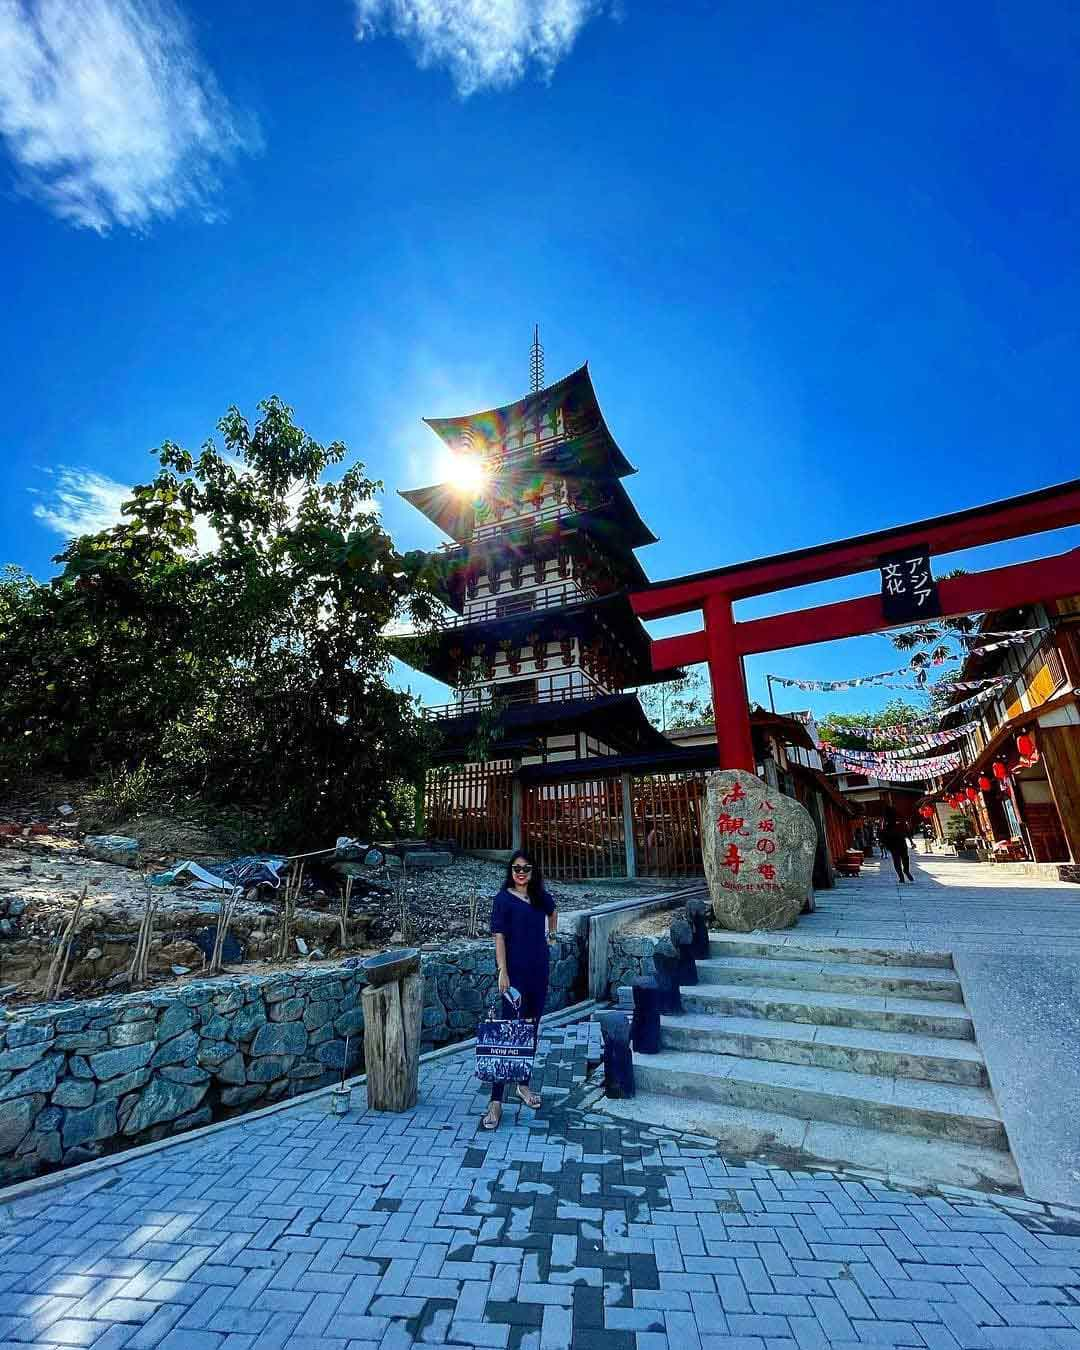 Litle Kyoto di Asia Heritage Pekanbaru Image from @asiaheritage.id_